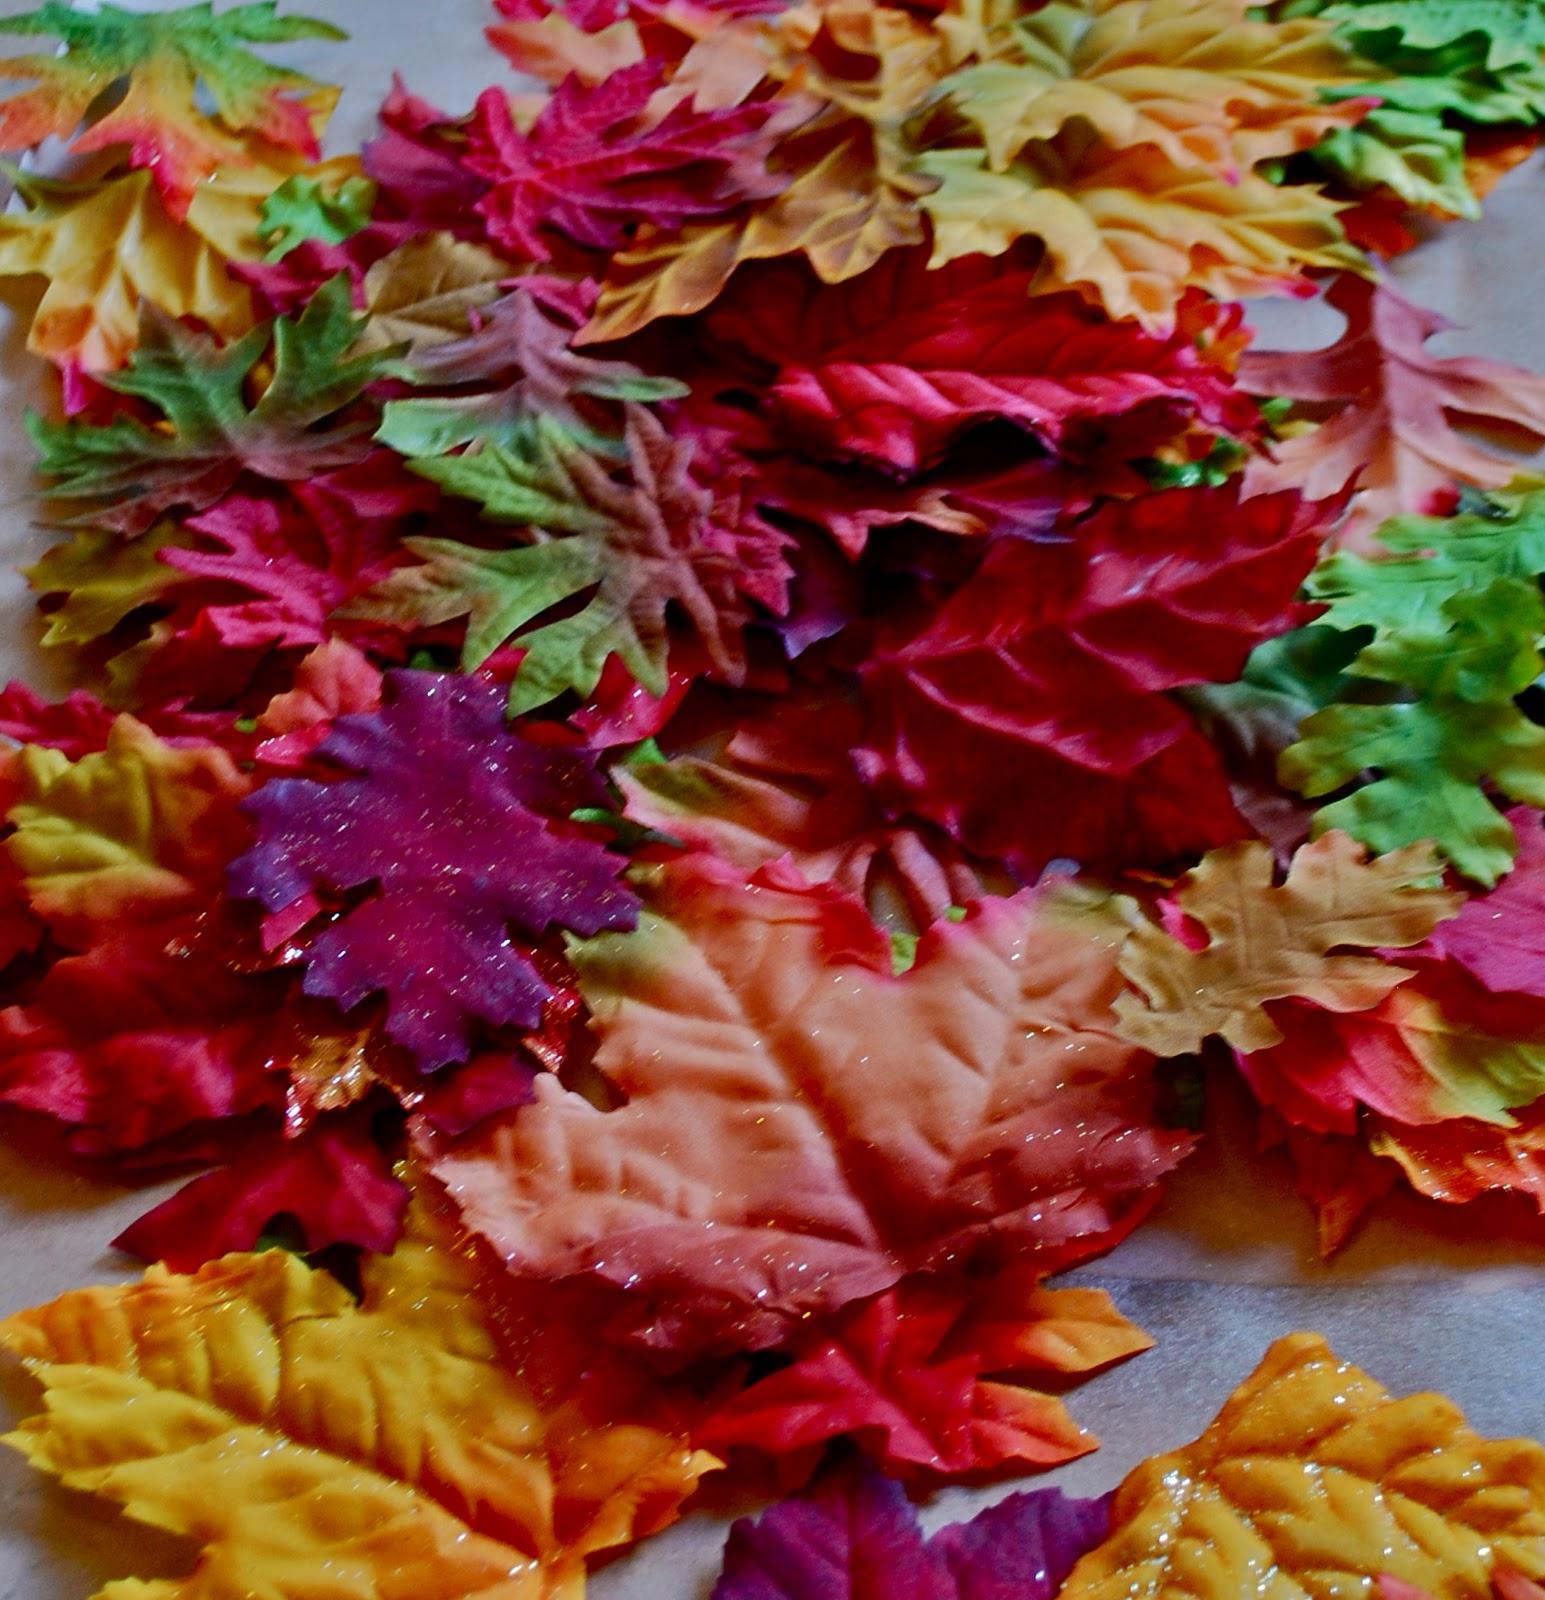 Fall Leaves Wreaths - Amanda Jane Brown